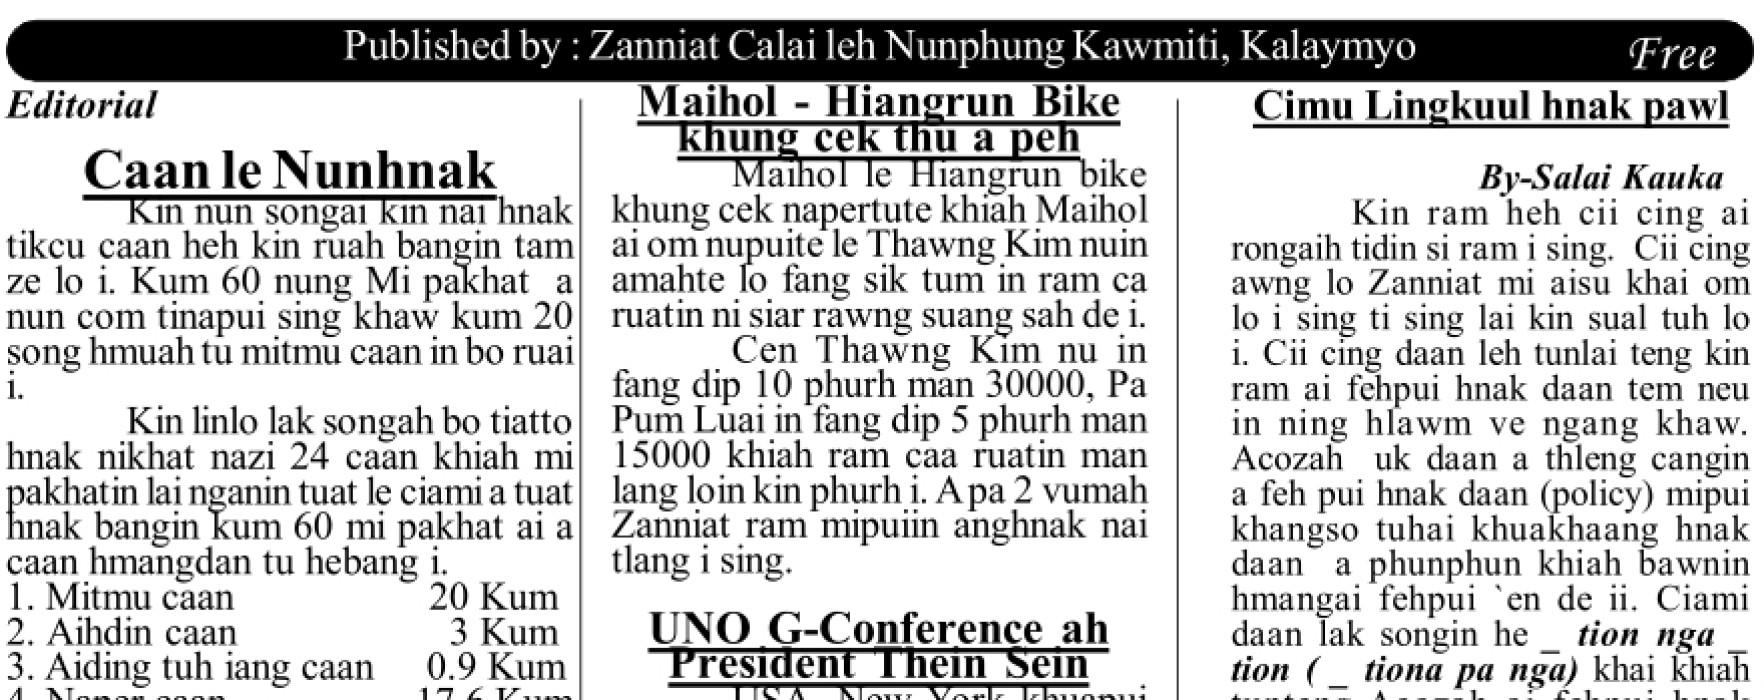 Lairawn Zanniat Auaw Vol-1 Issue-7 Oct 2012